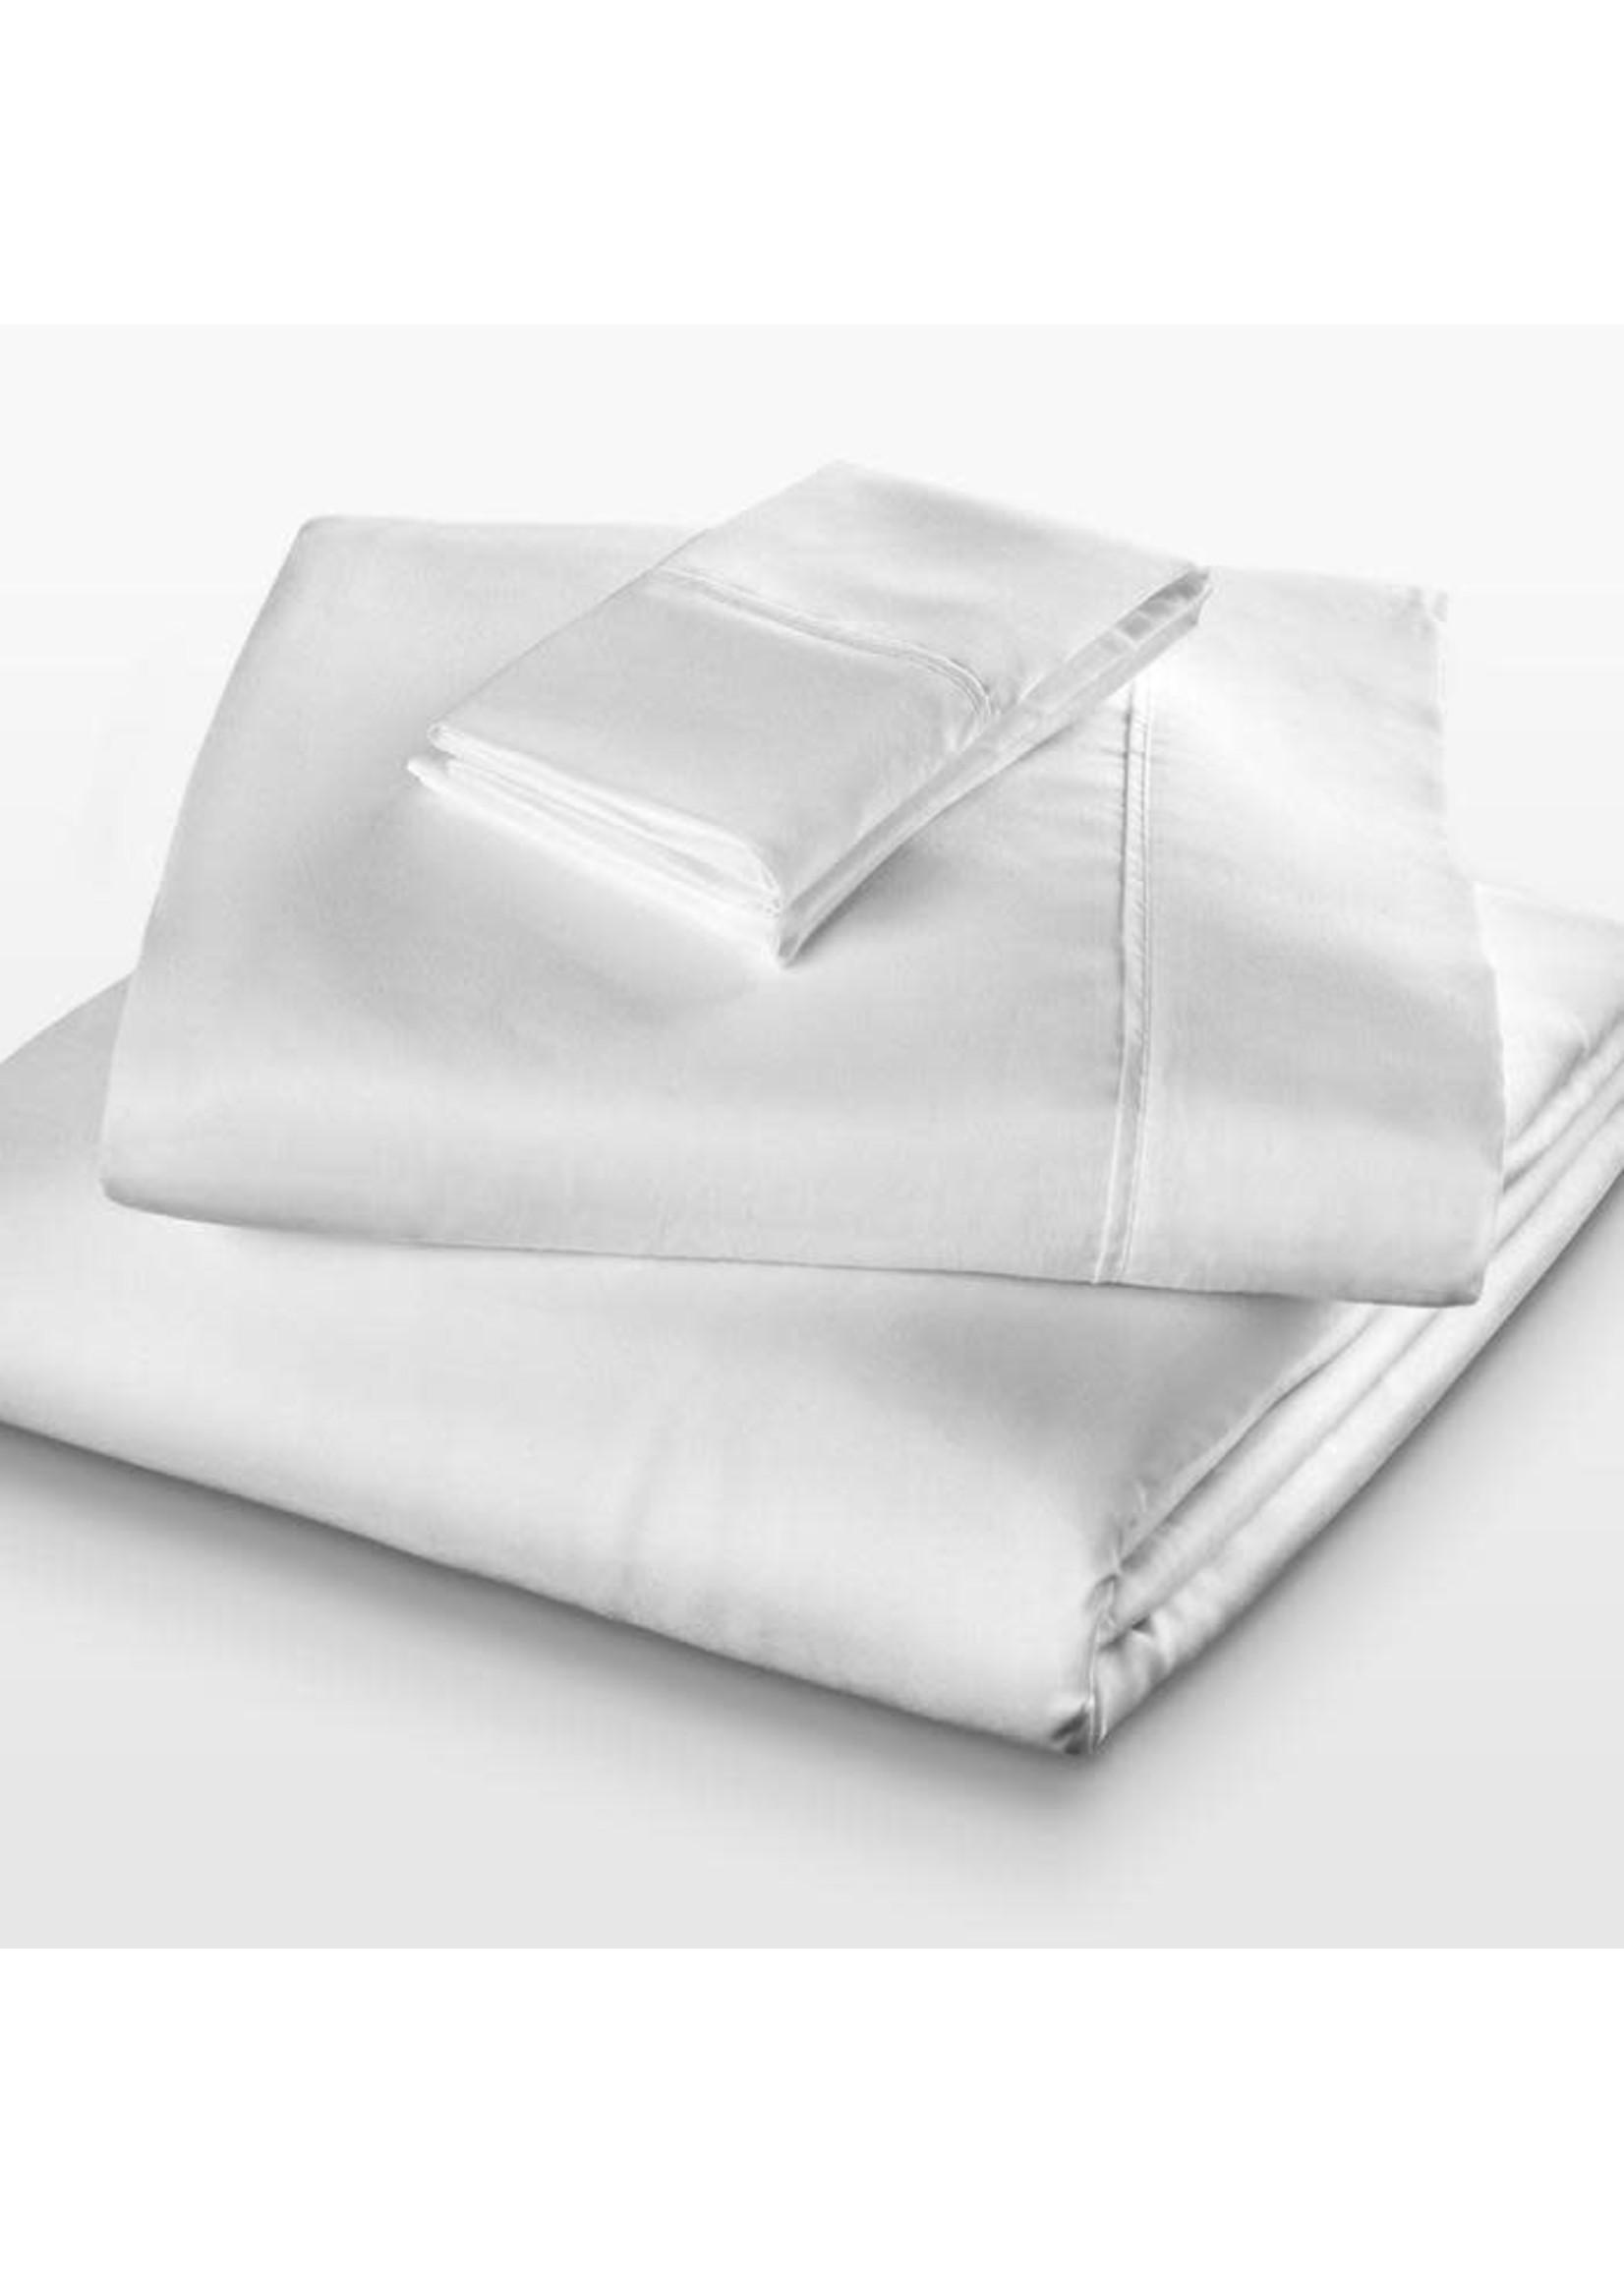 PURECARE MICROFIBER LITE SHEET SET TWIN WHITE